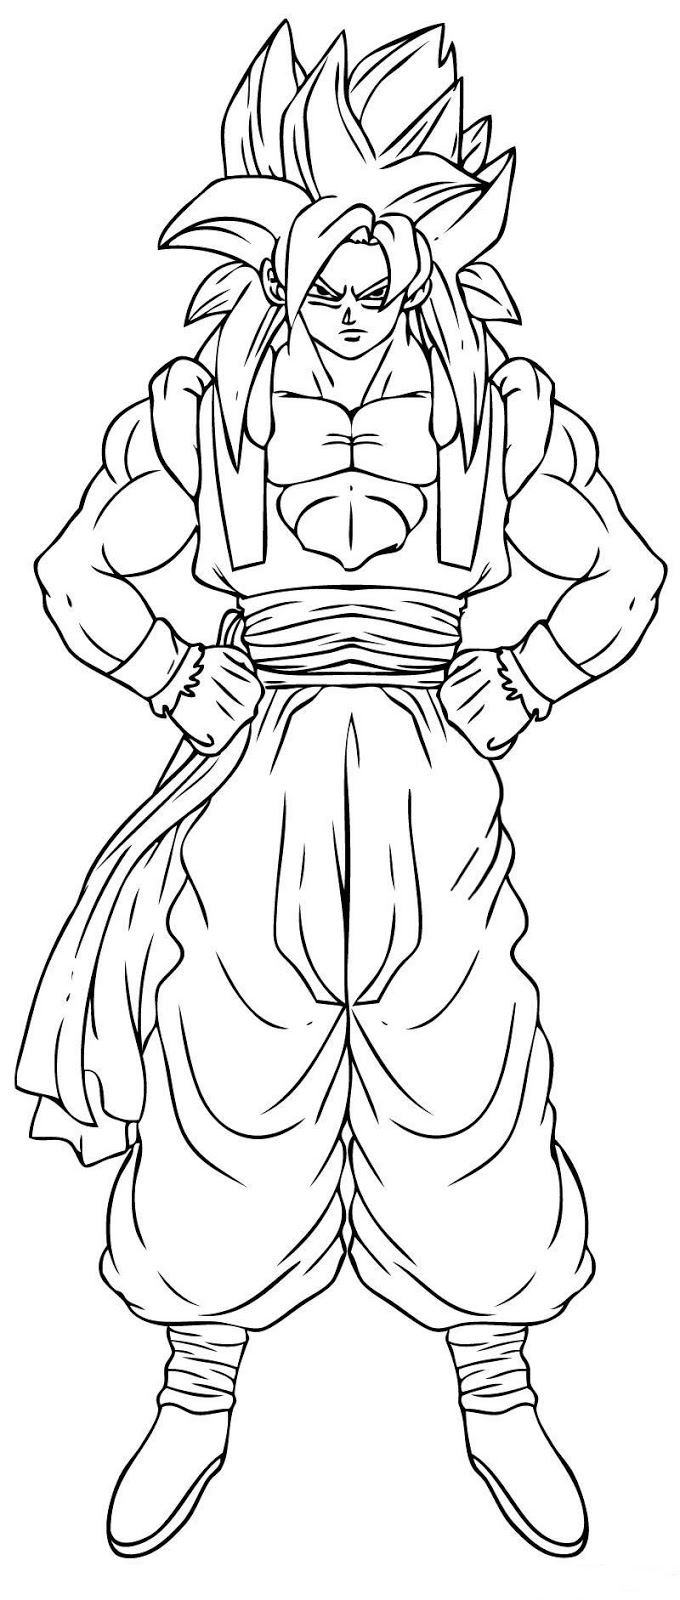 How to Draw Dragon Ball Z Goku Super Saiyan